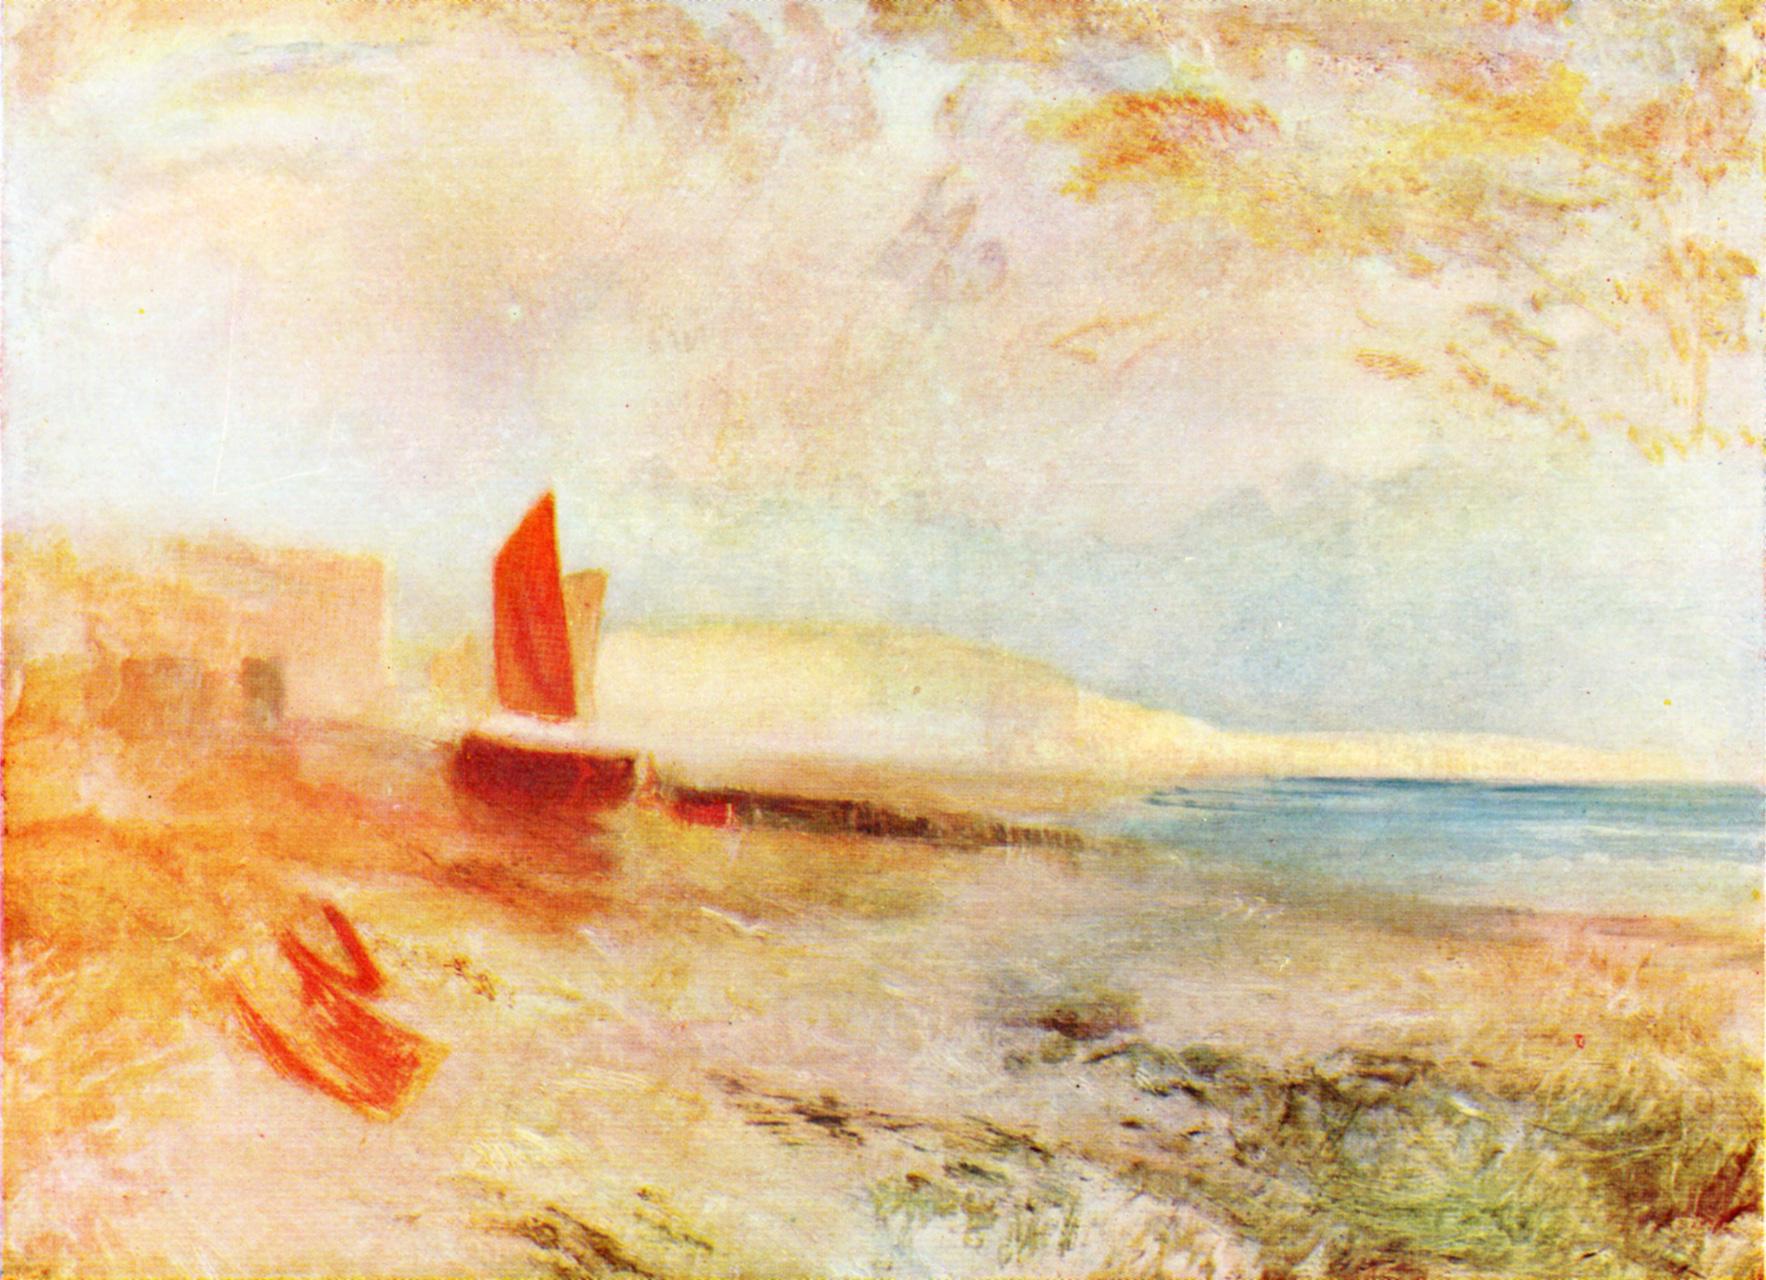 Turner, J.M.W. / later color prints